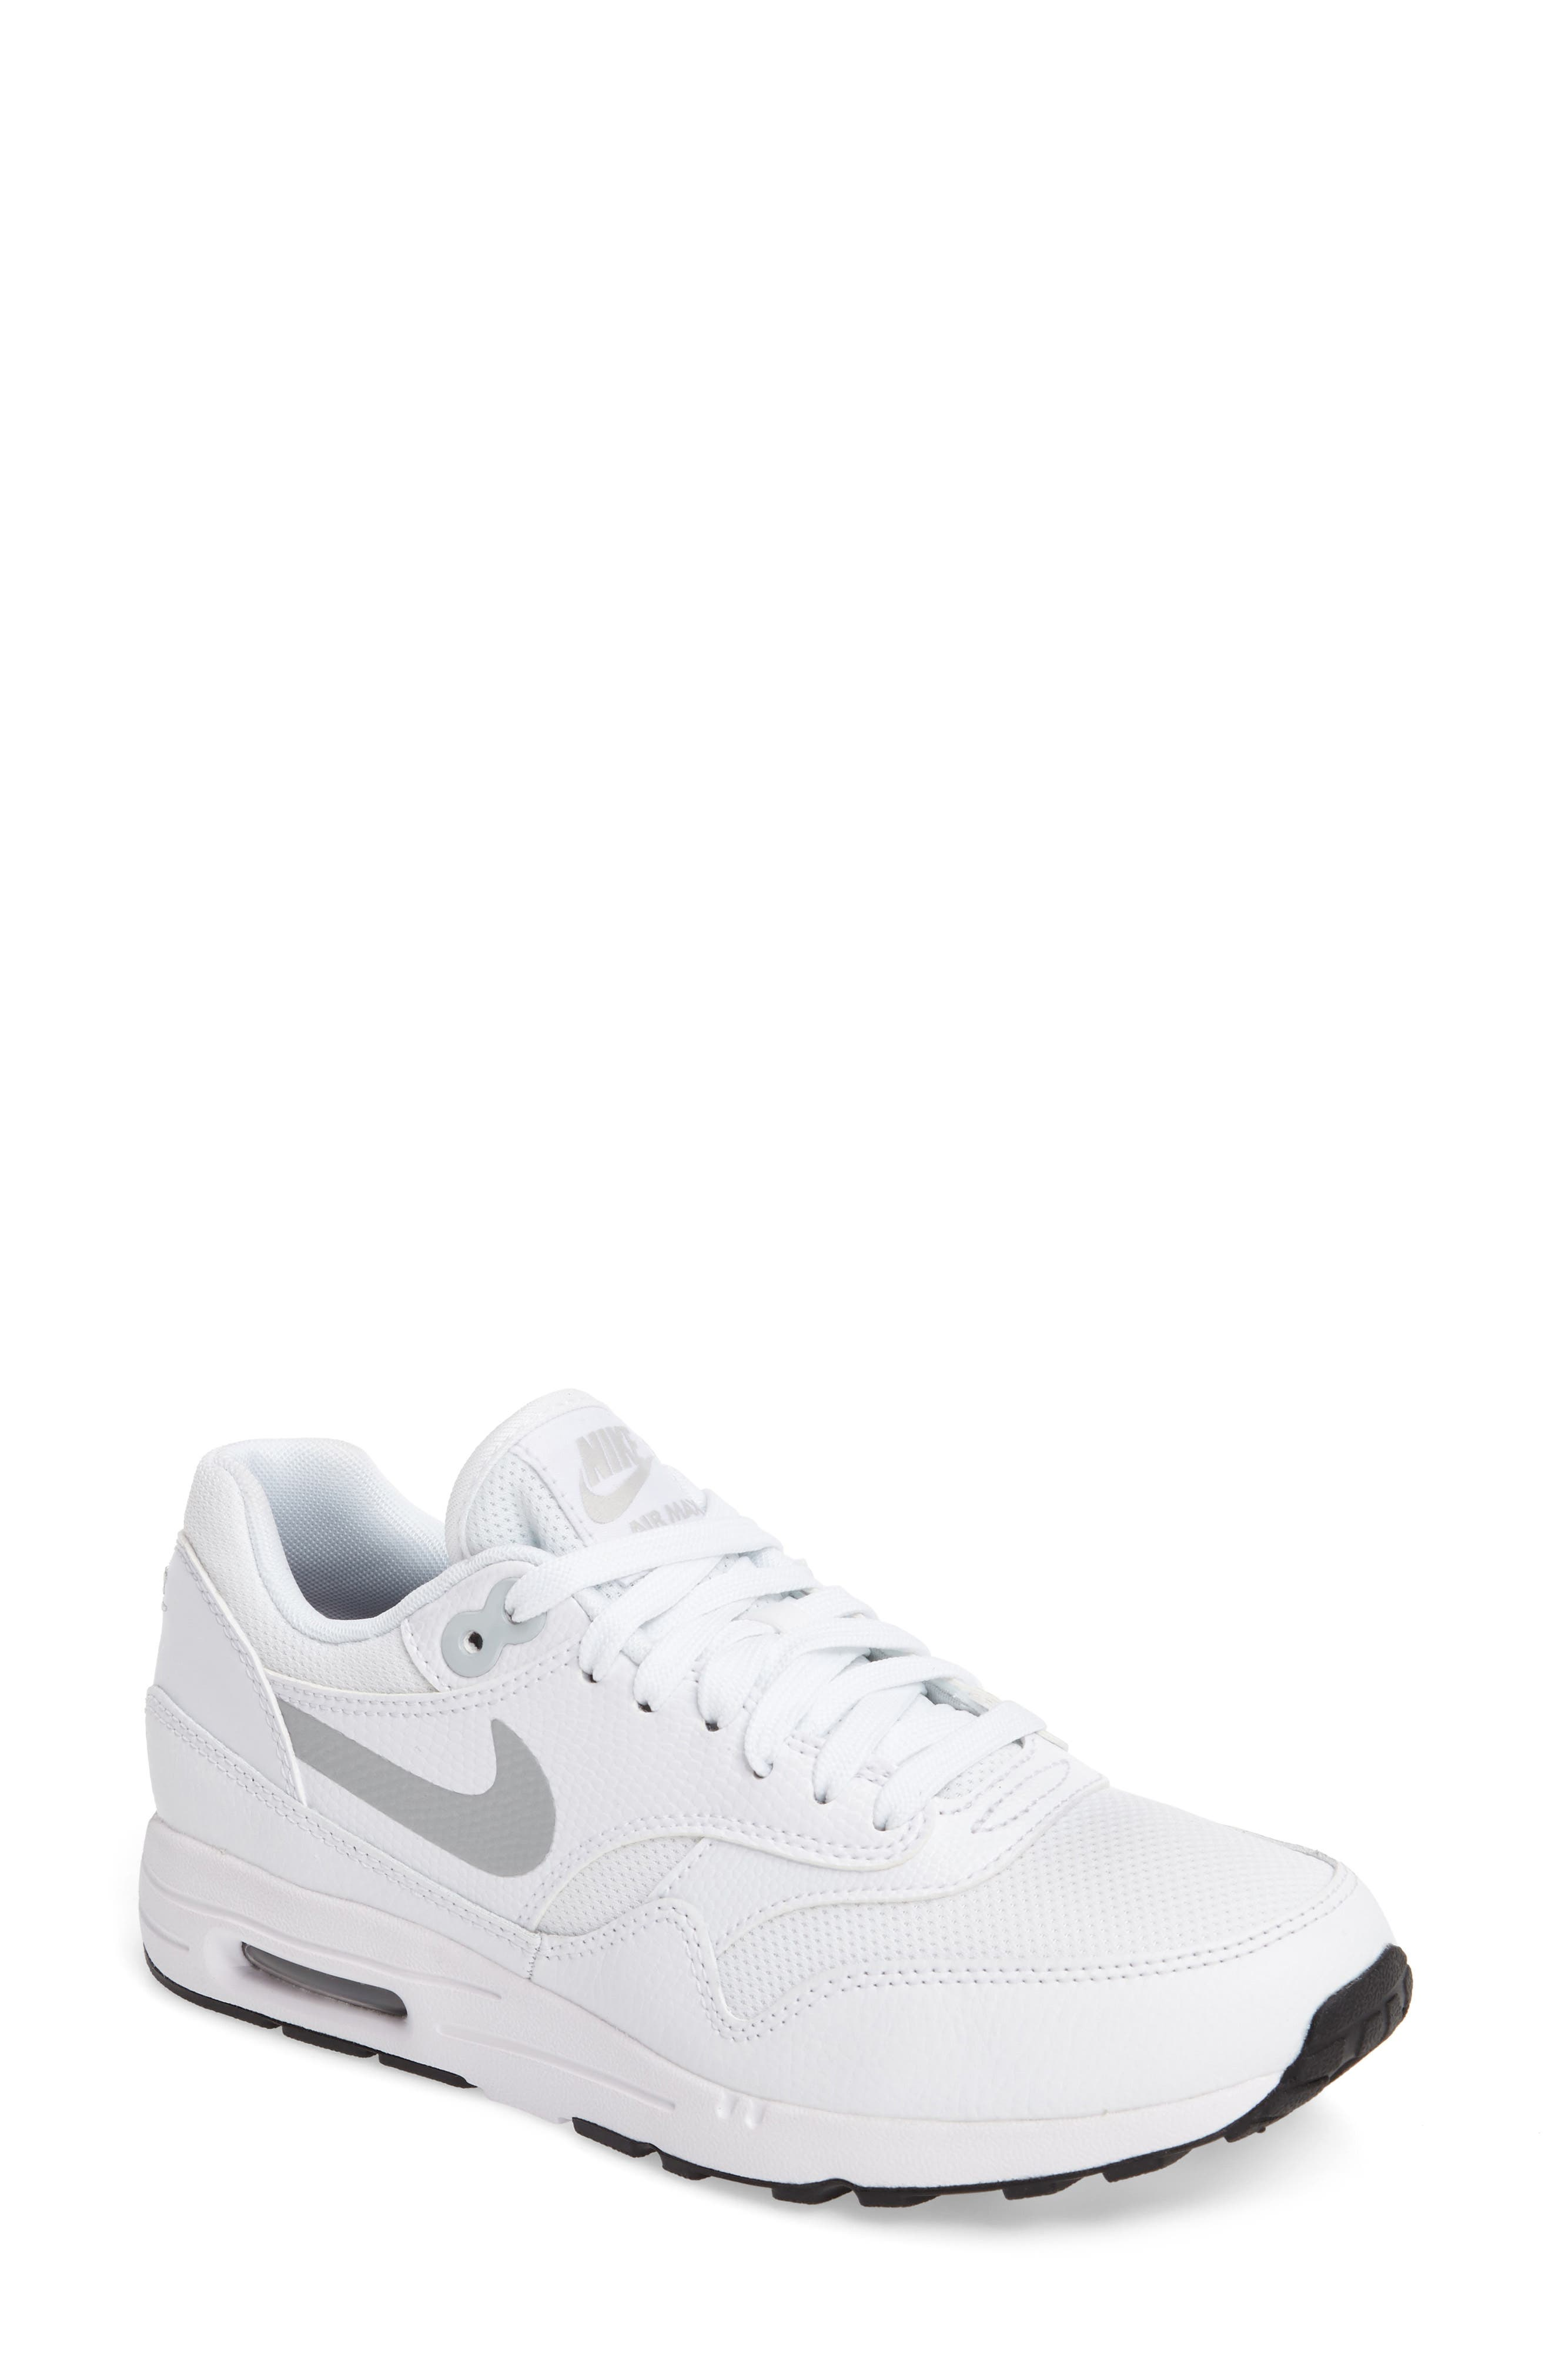 Main Image - Nike Air Max 1 Ultra 2.0 Running Shoe (Women)